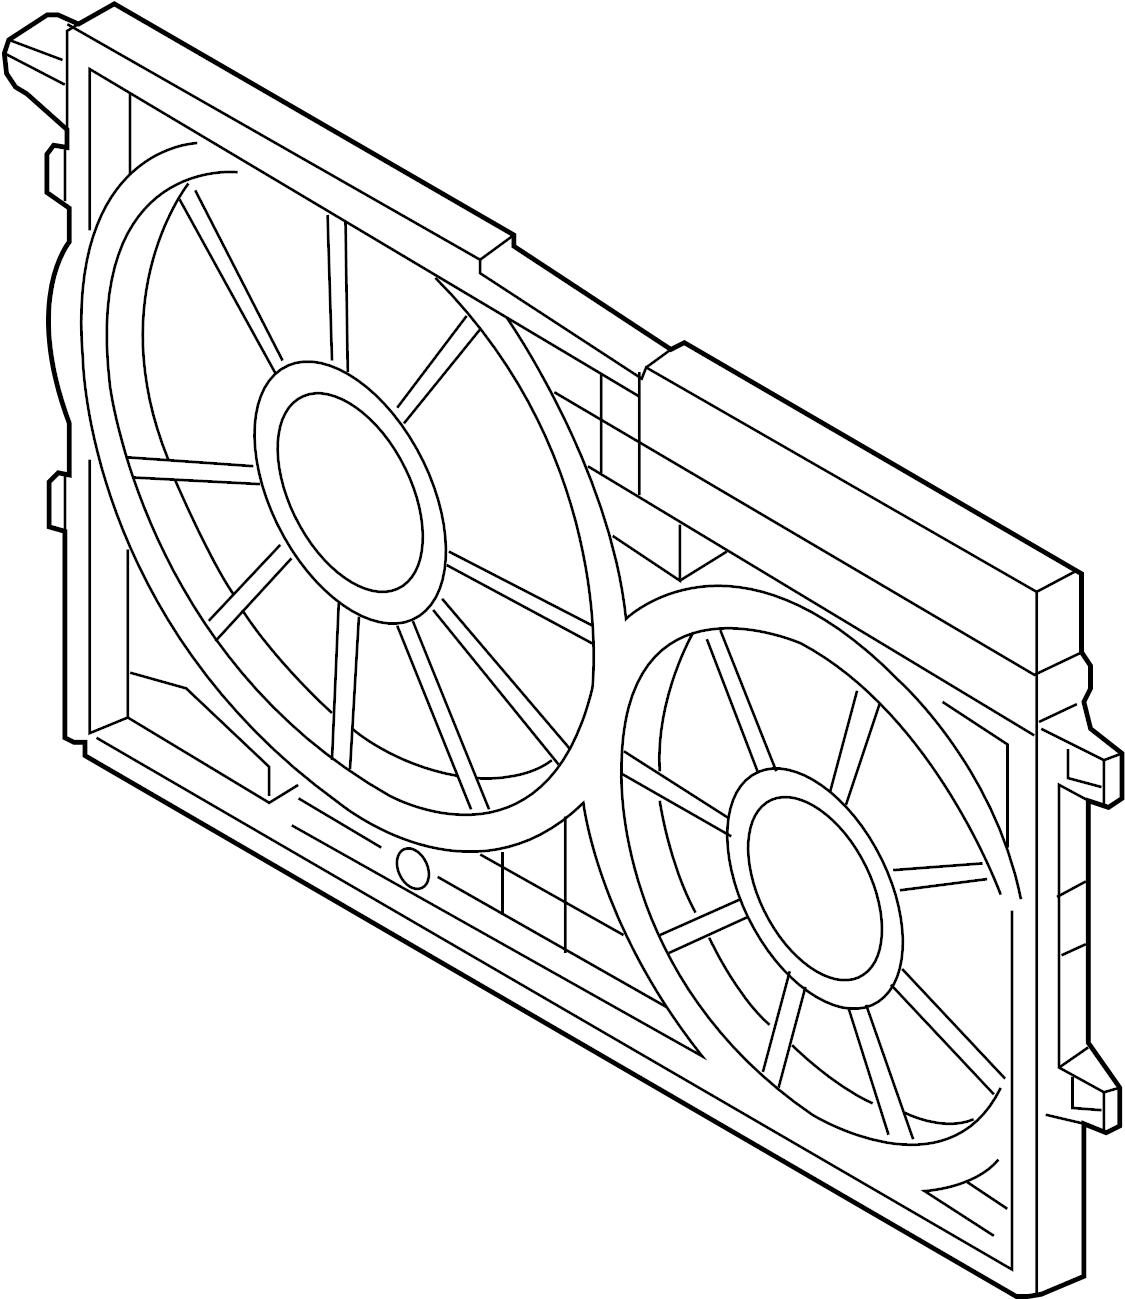 2002 volvo v70 box wiring diagram 04 Volvo C70 vw tiguan 2018 manual transmission engine diagram and wiring diagram volvo v70 wagon 2002 volvo v70